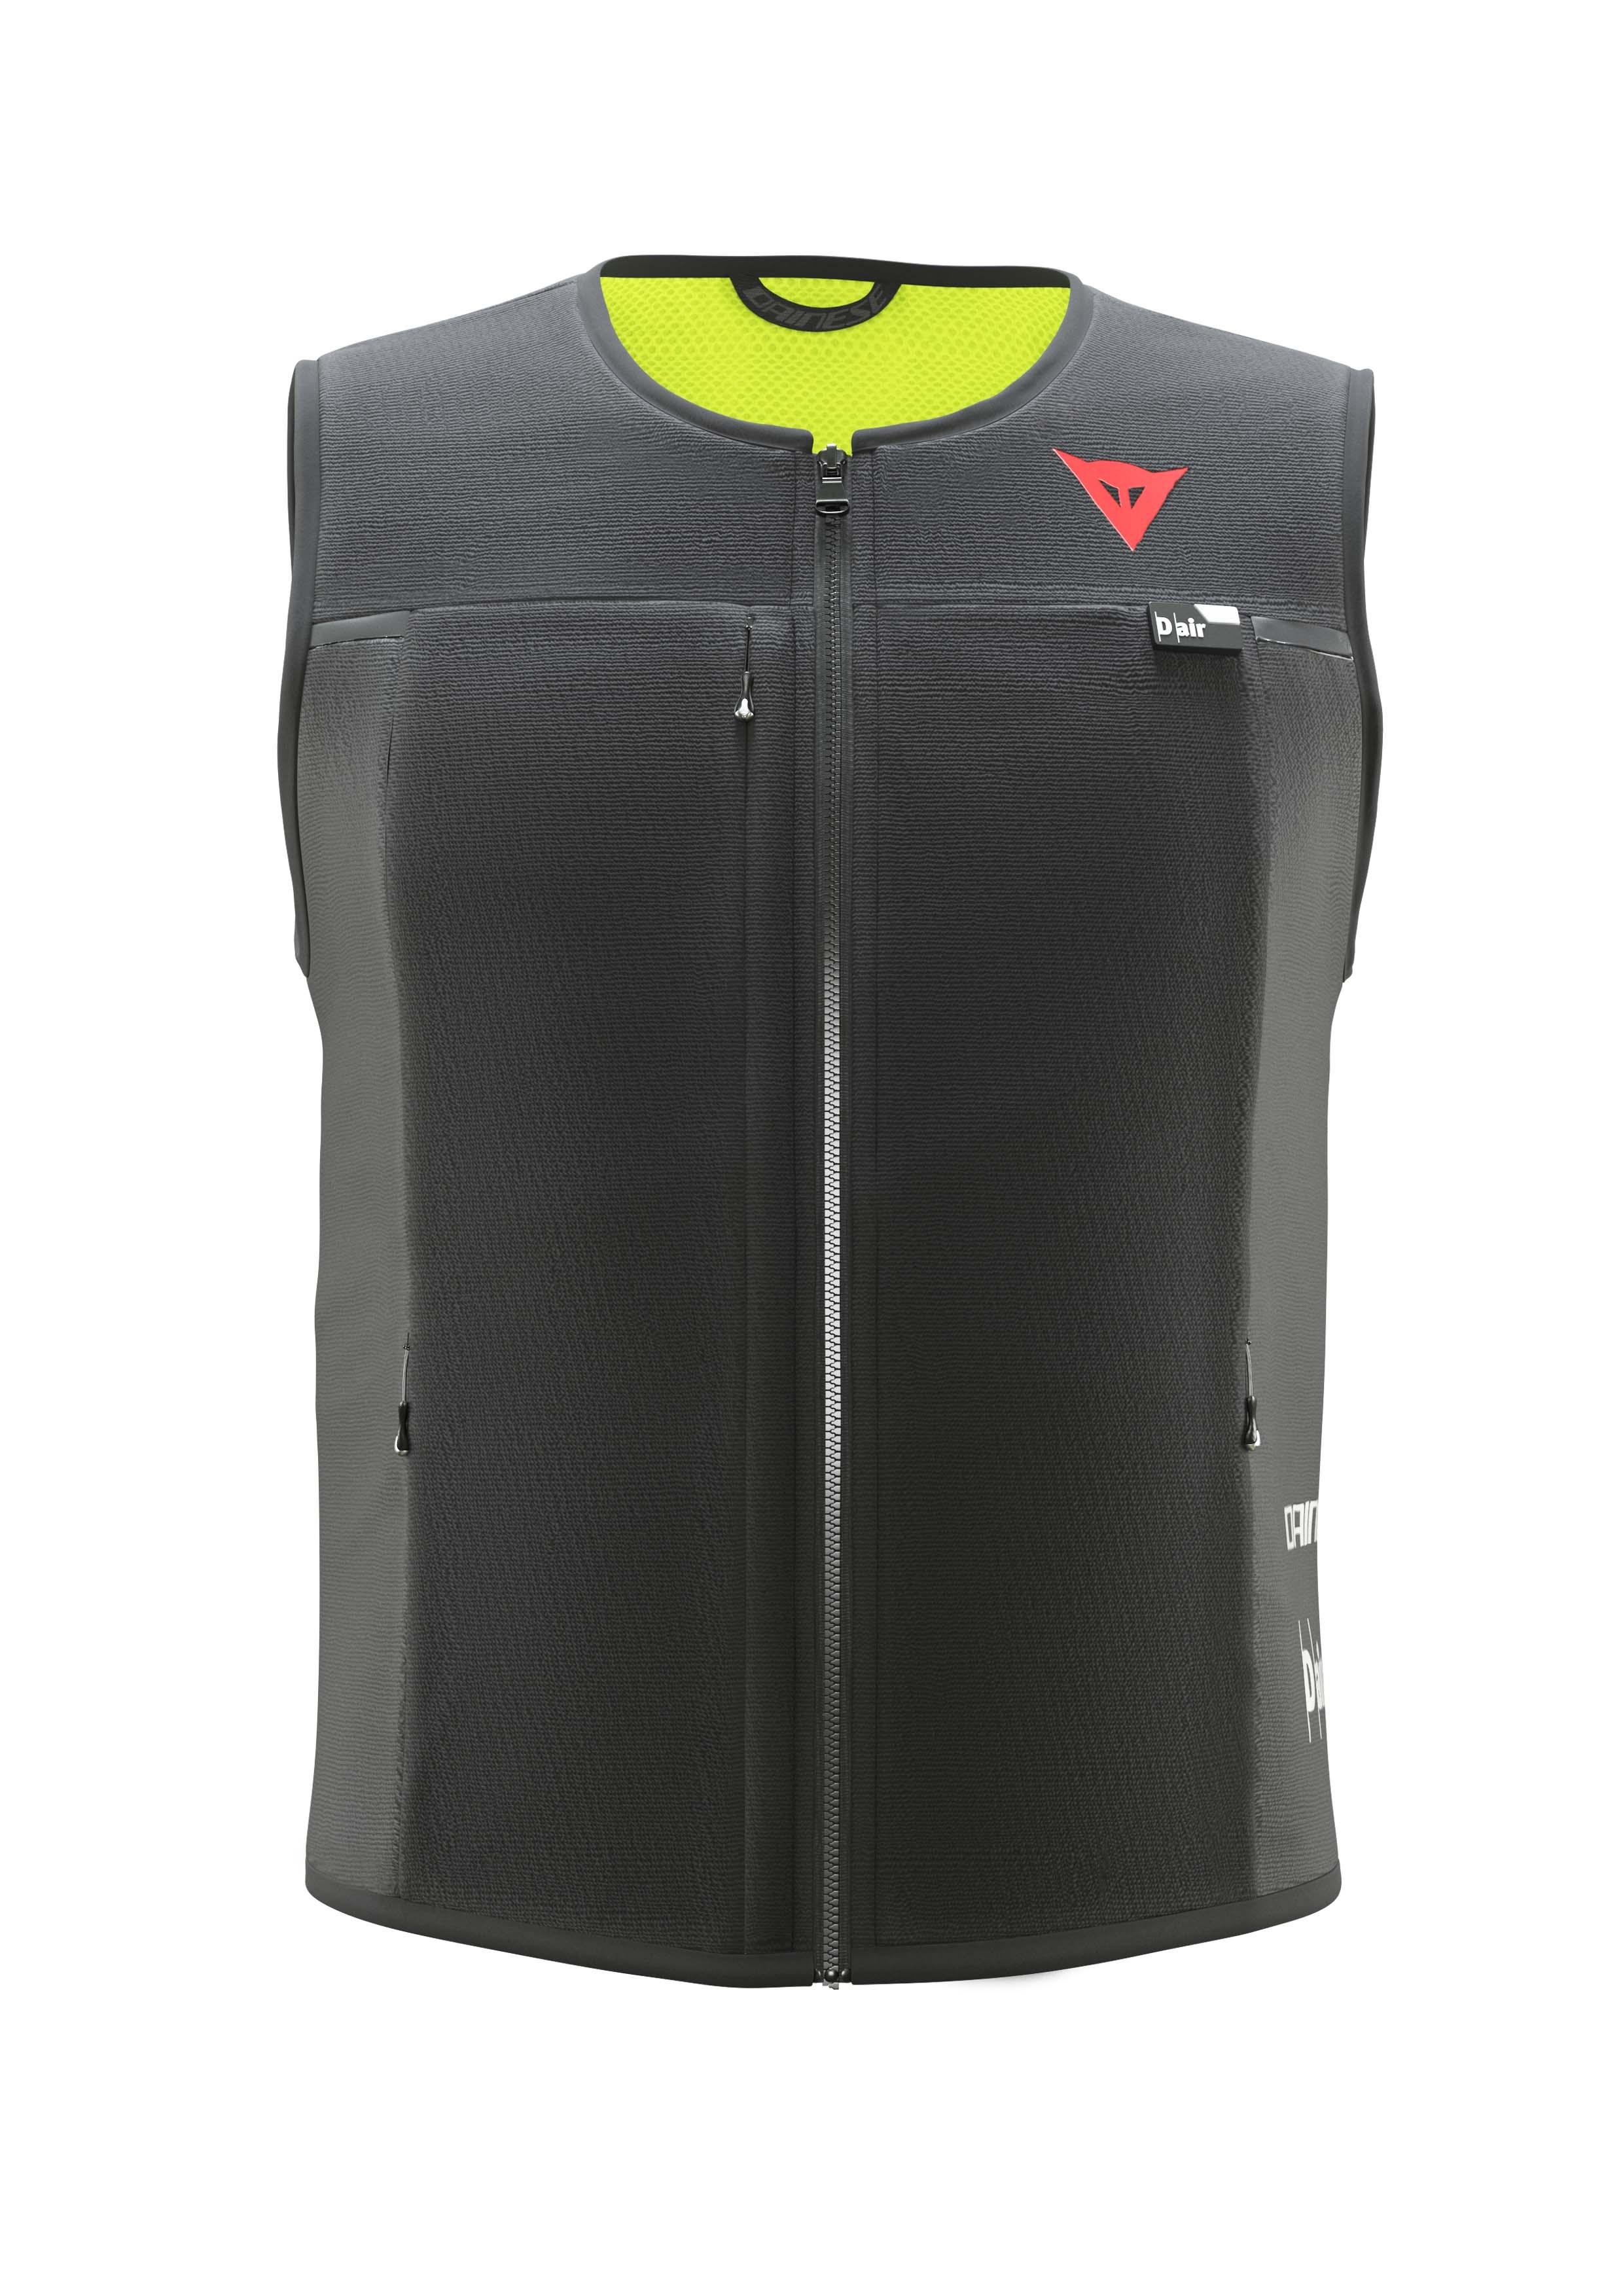 Dainese-Smart-Jacket-airbag-03